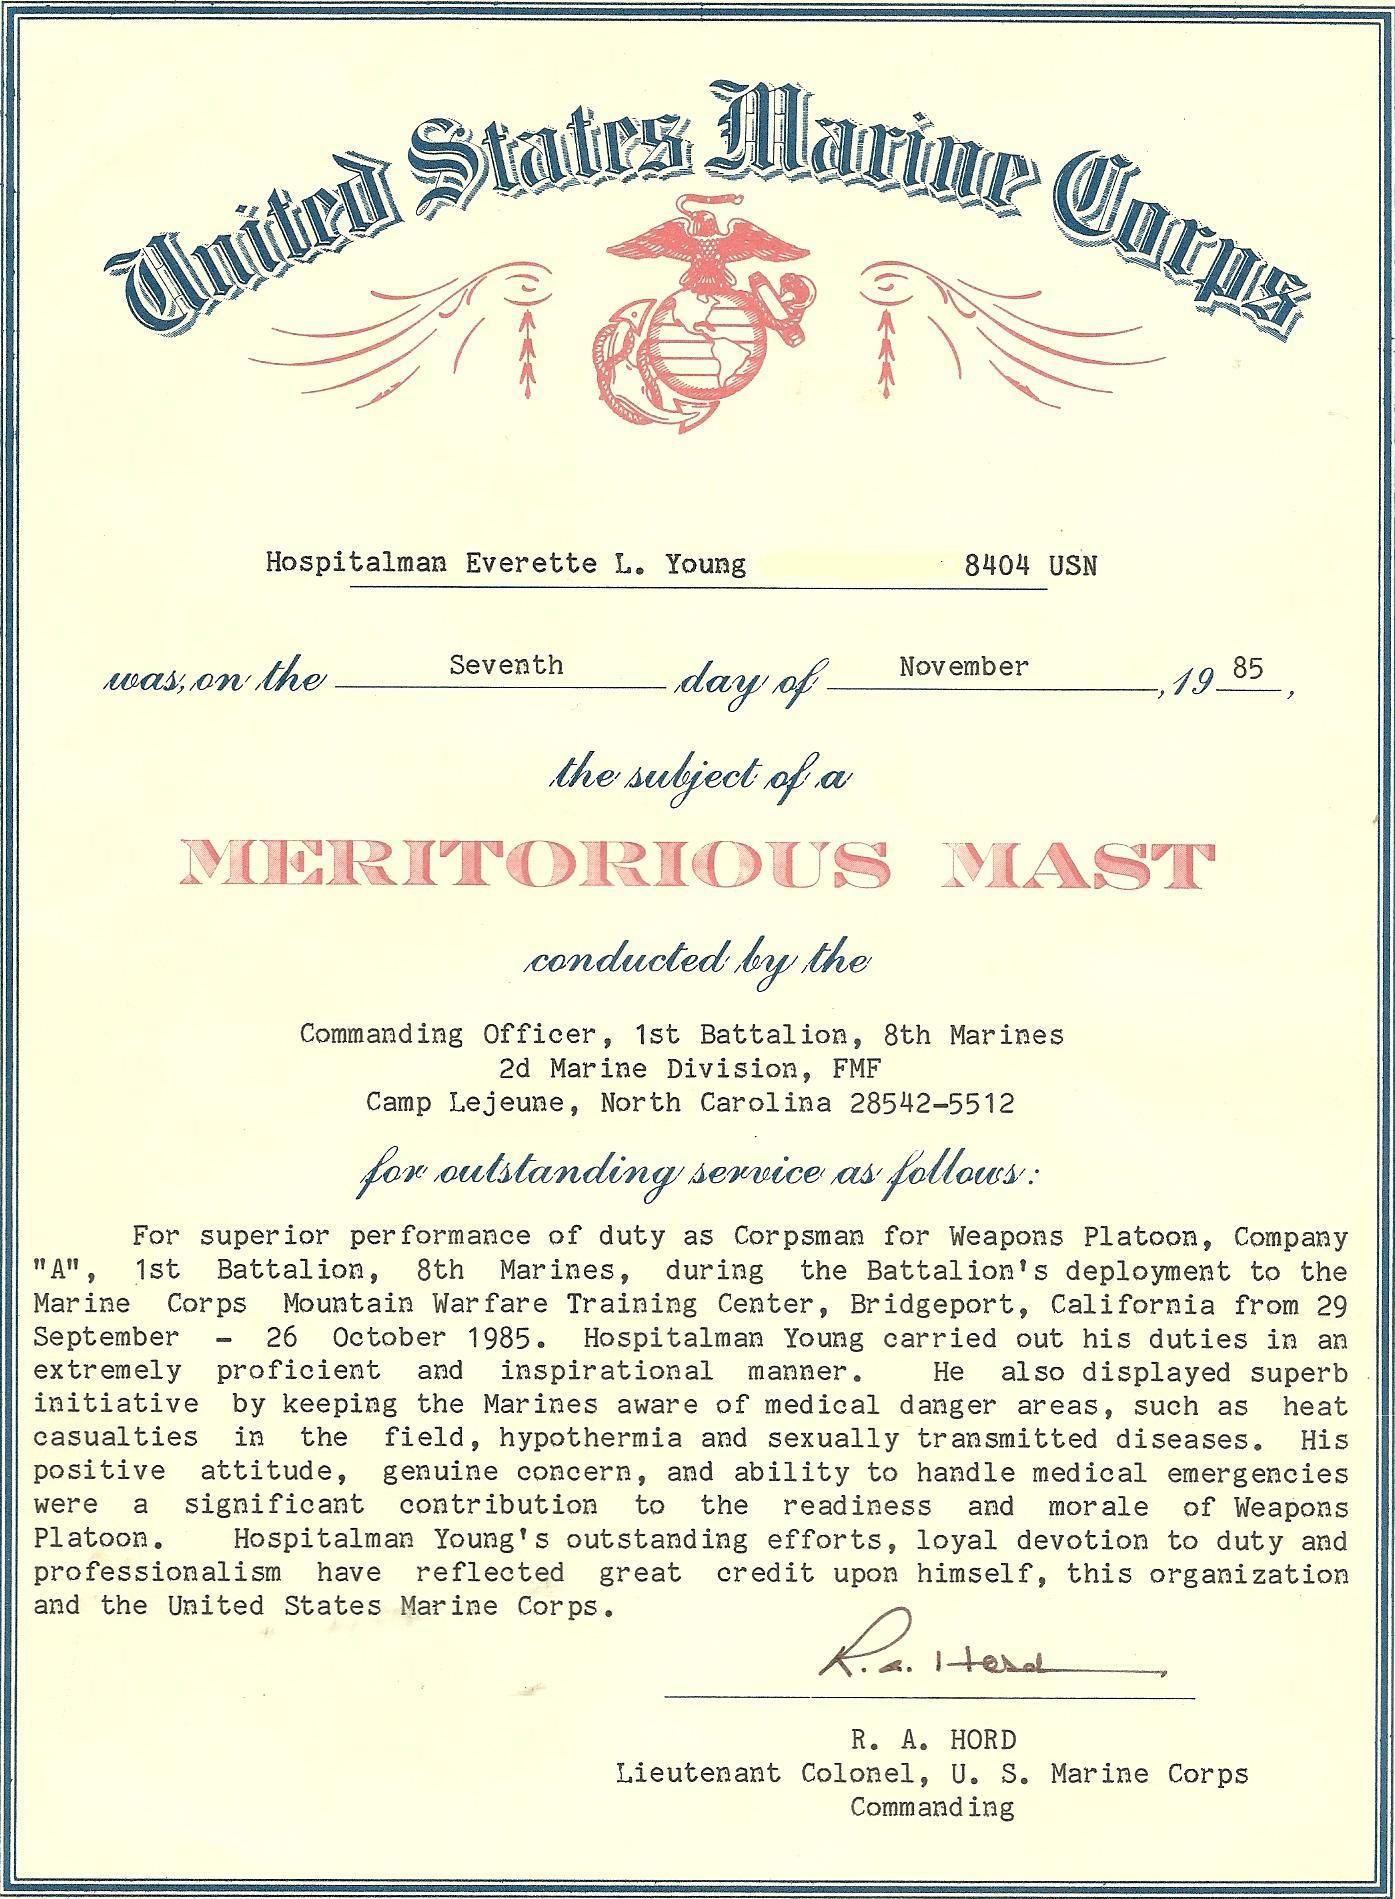 My Meritorious Captains Mast | The U.S. Navy | Pinterest